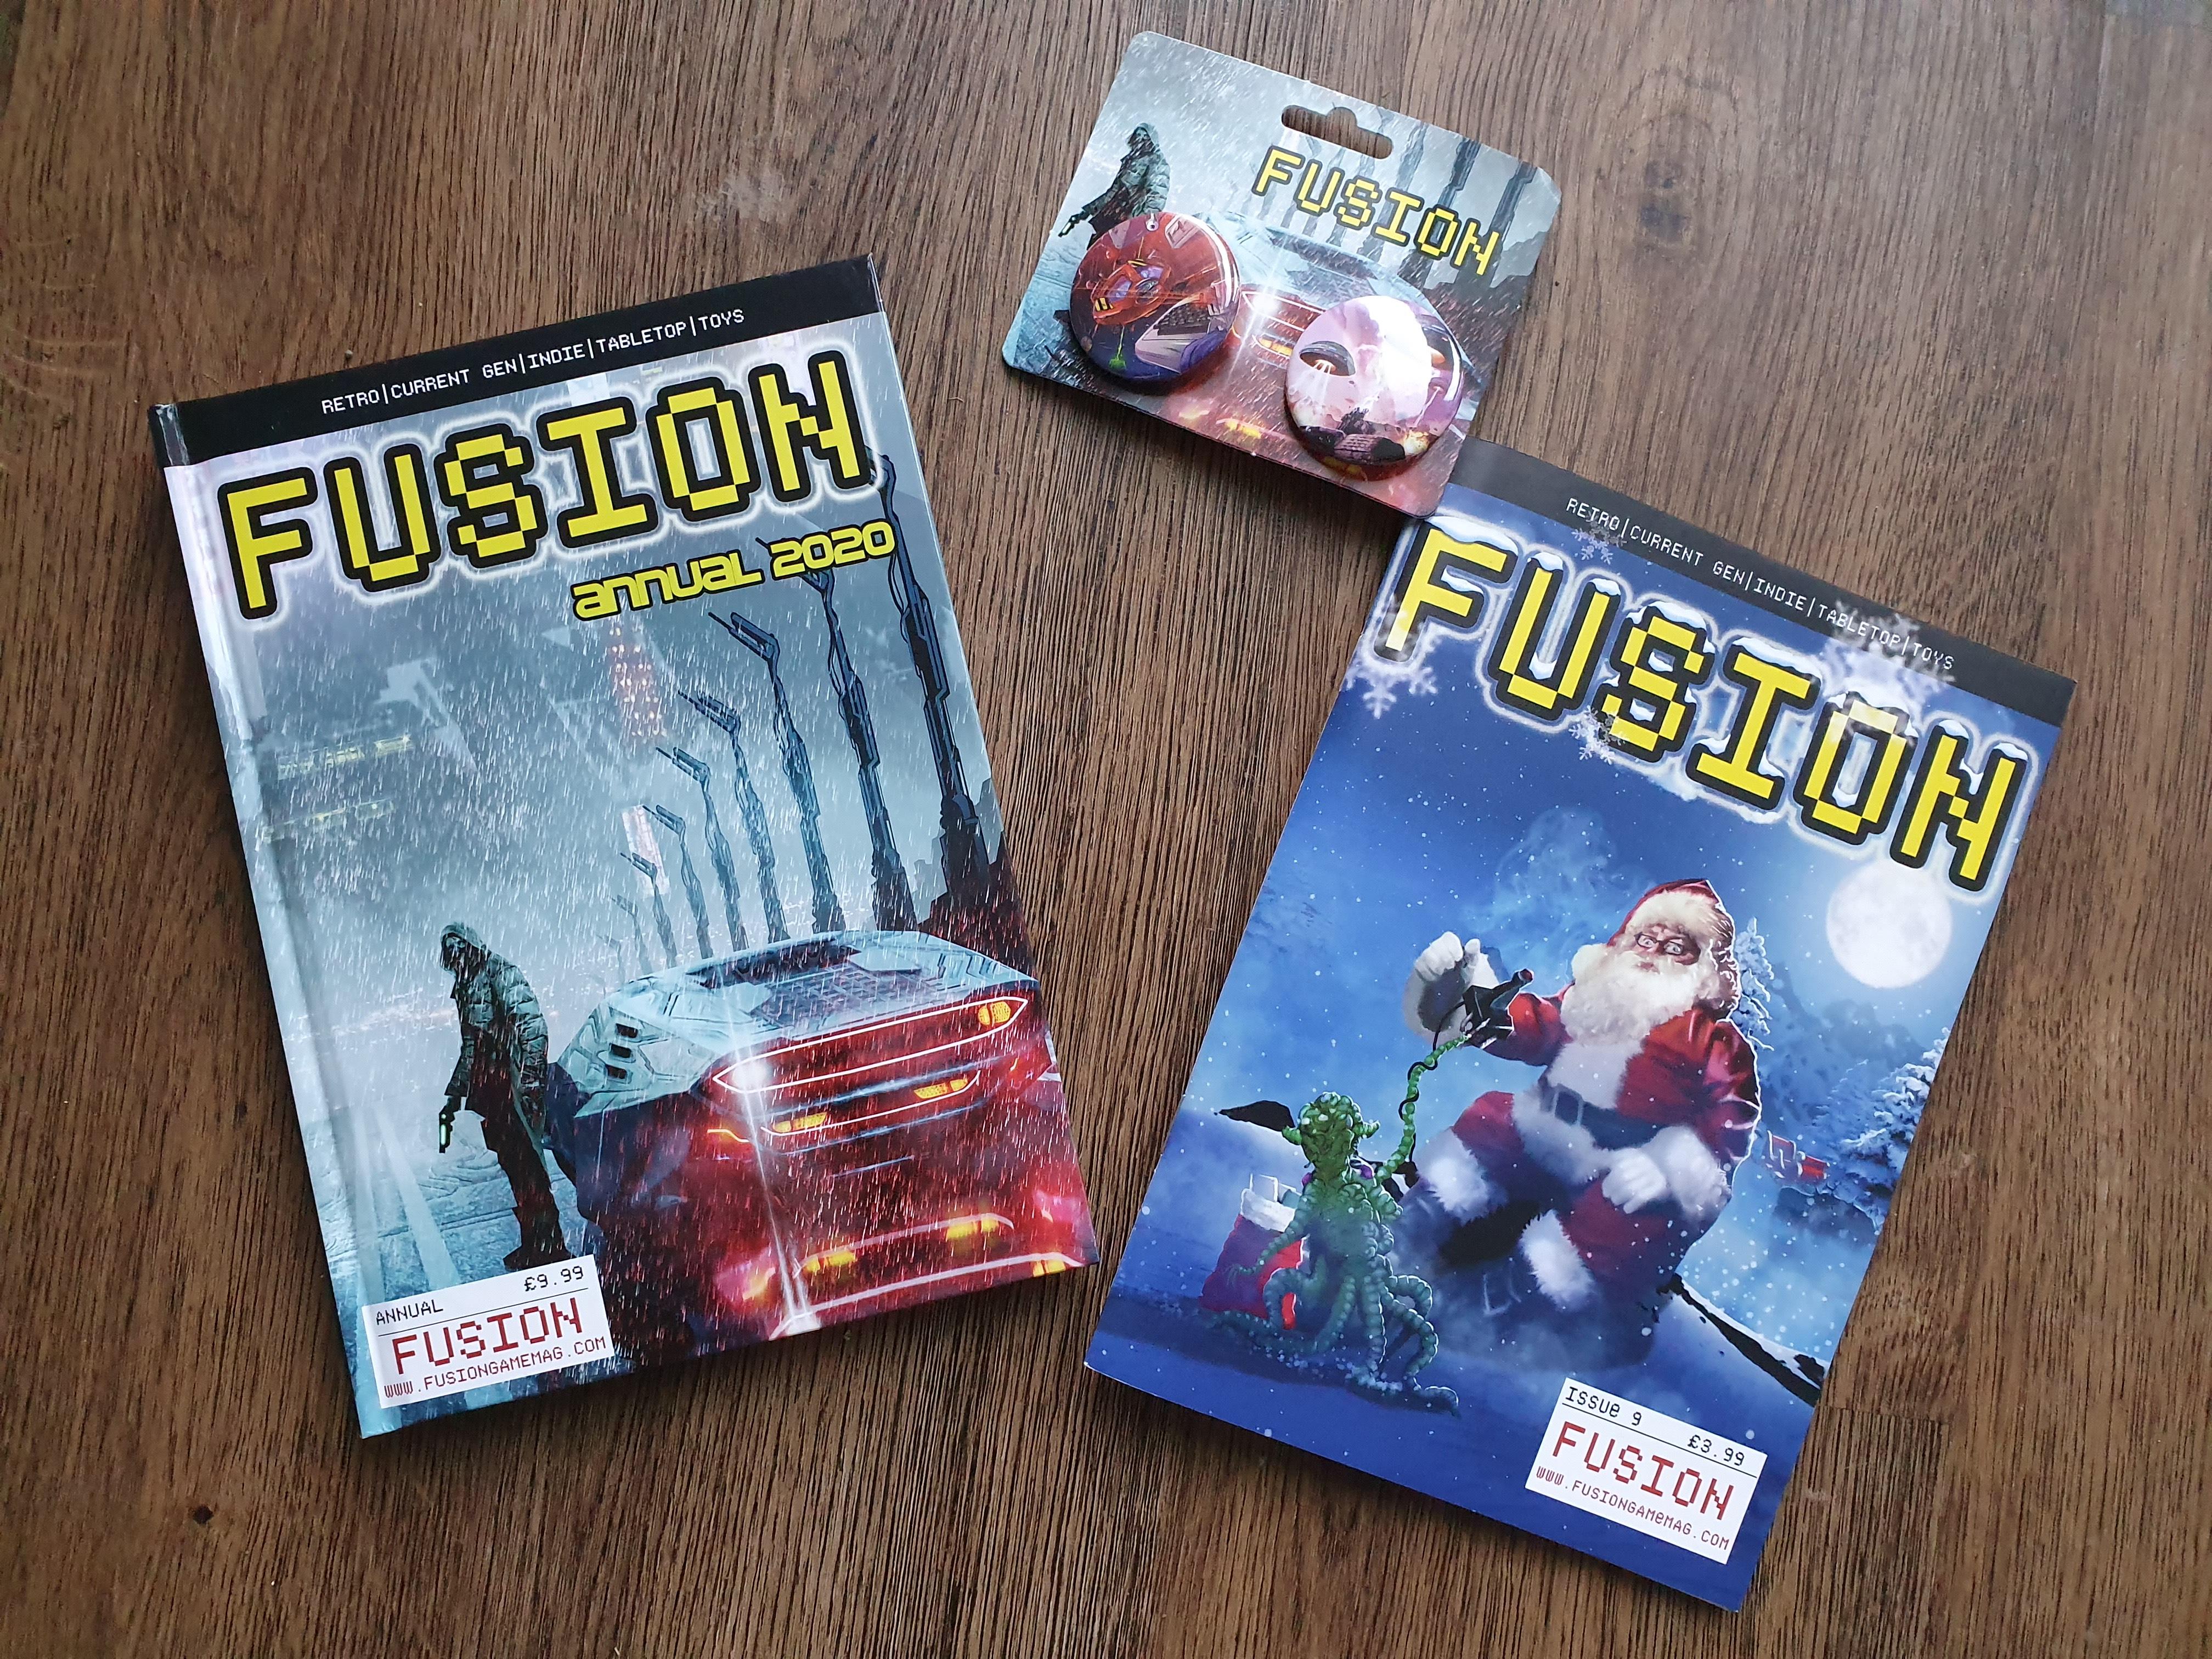 Free PDF Retro books to read during the outbreak care of Fusion Retro